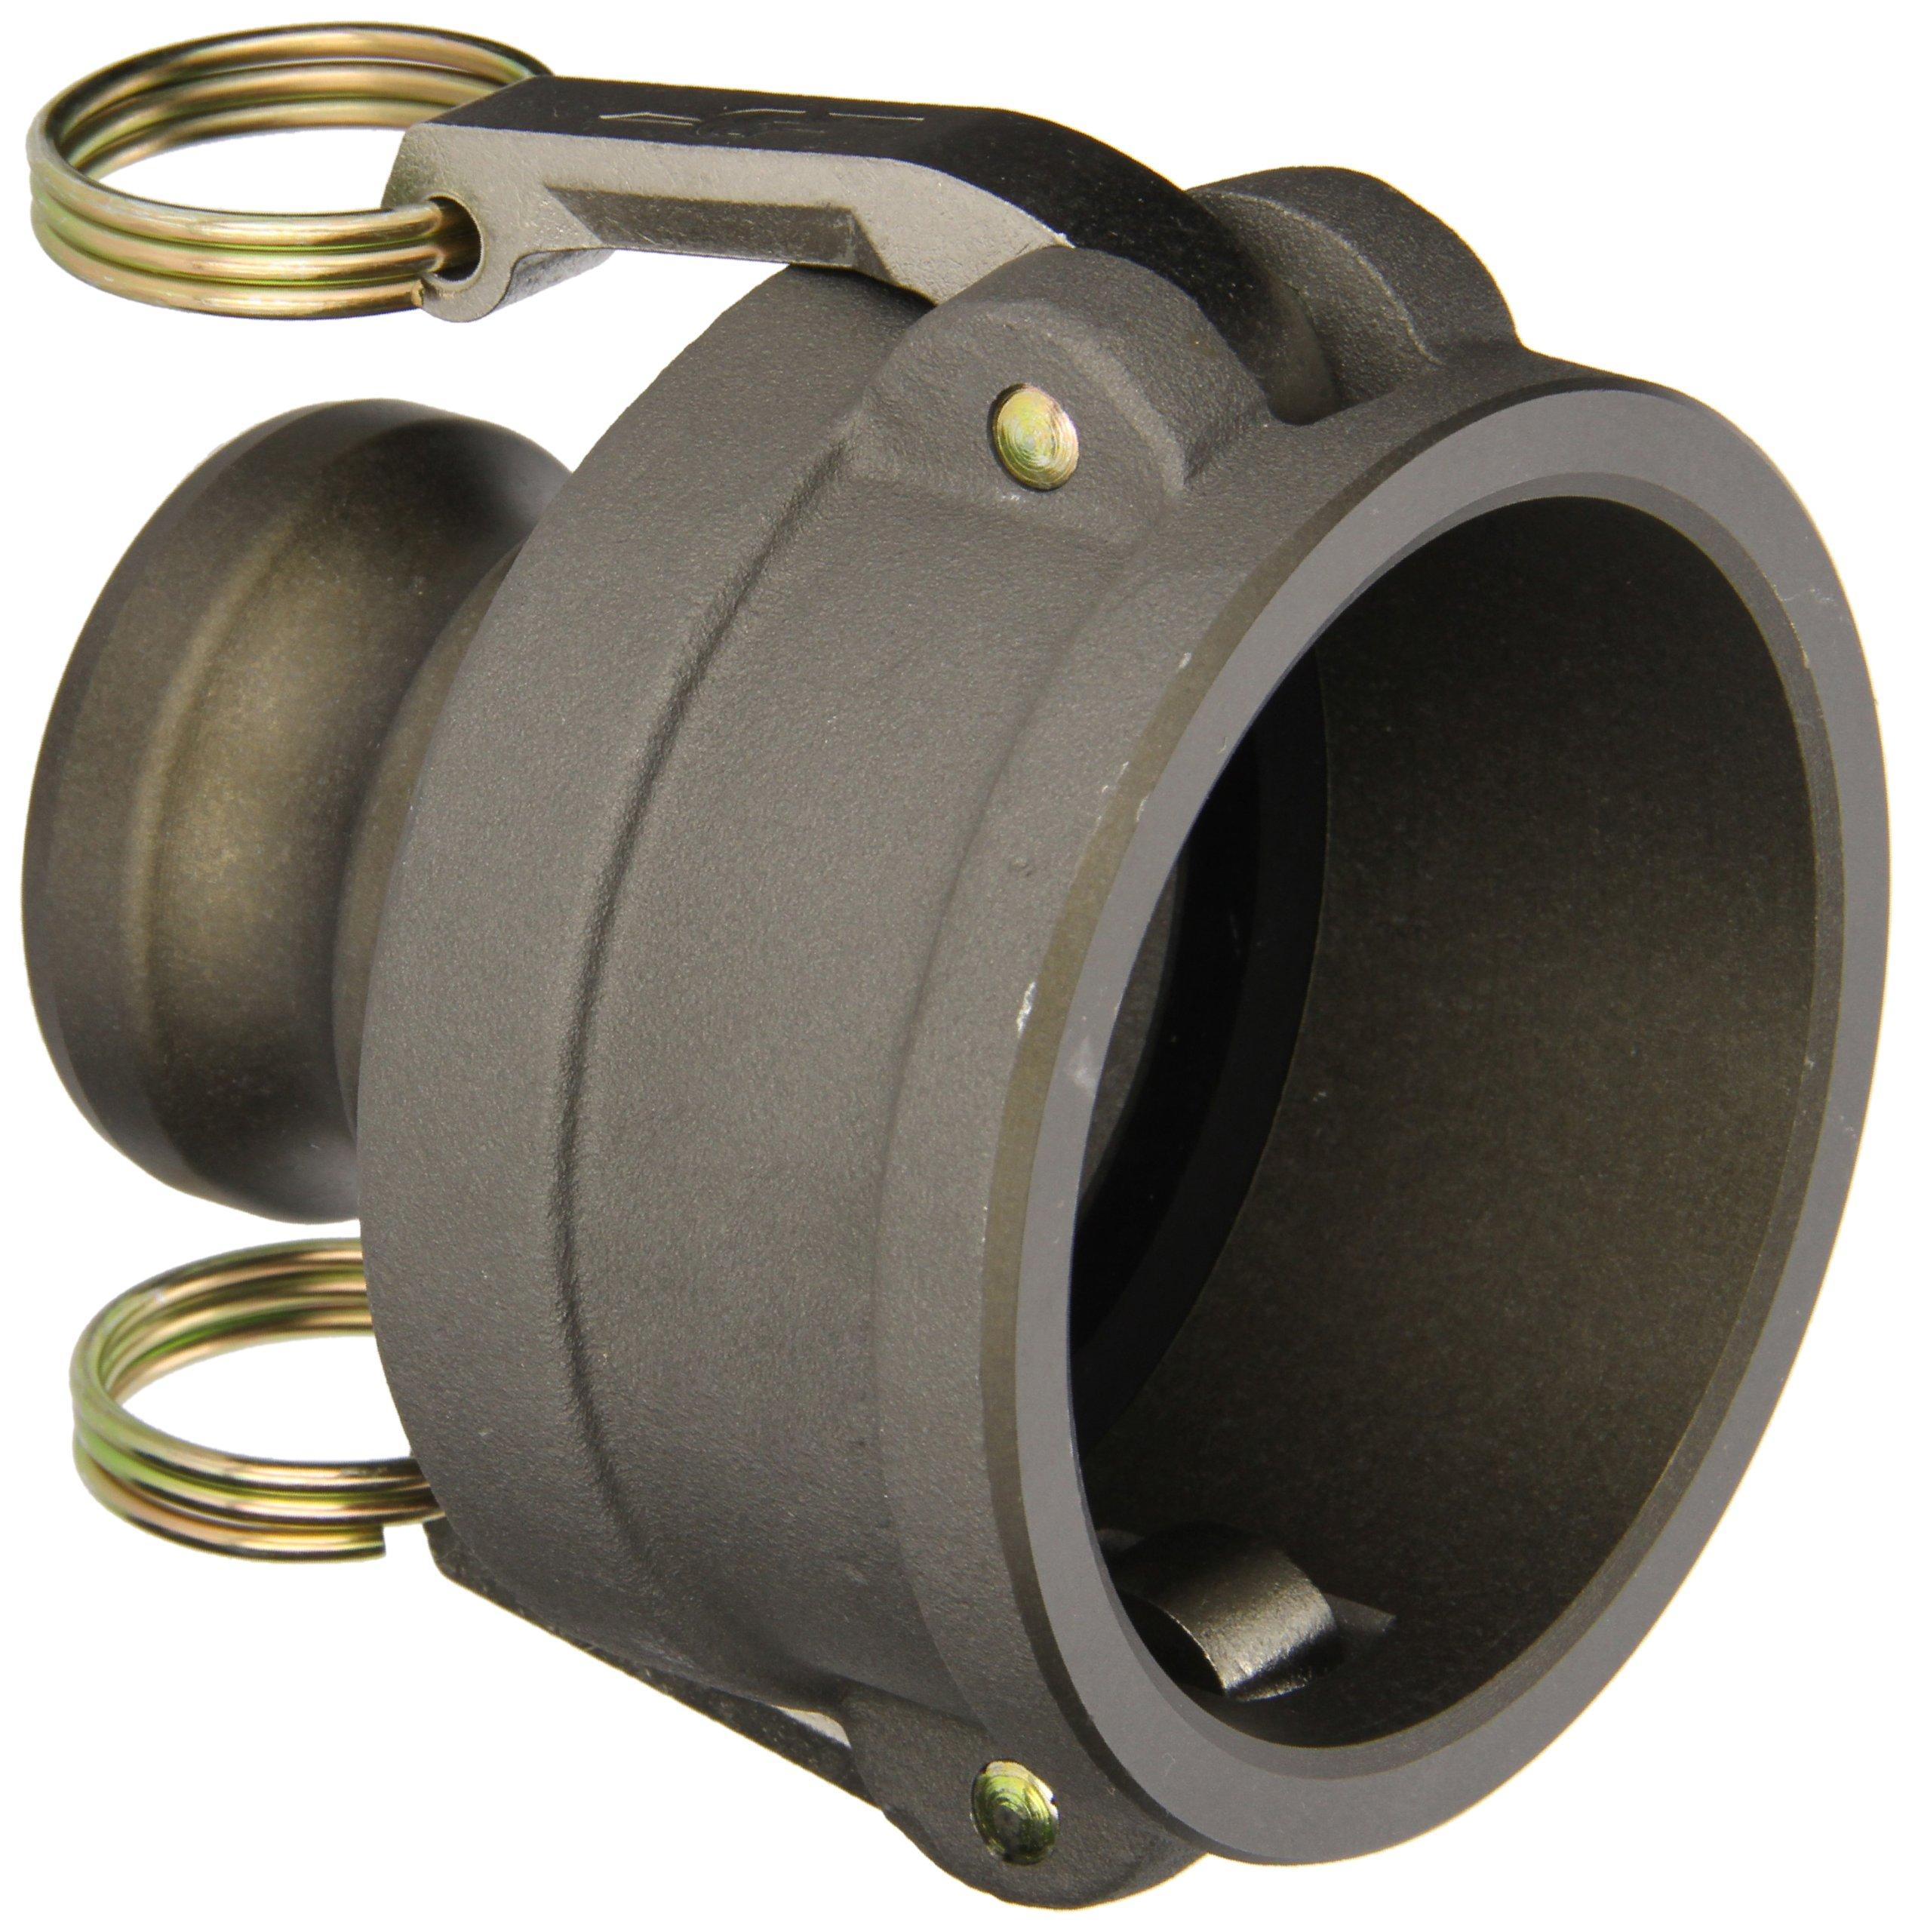 PT Coupling CXA Series Hard Coat Aluminum Reducer Cam and Groove Hose Fitting, CXA Short Reducer, 6'' Coupler x 4'' Adapter